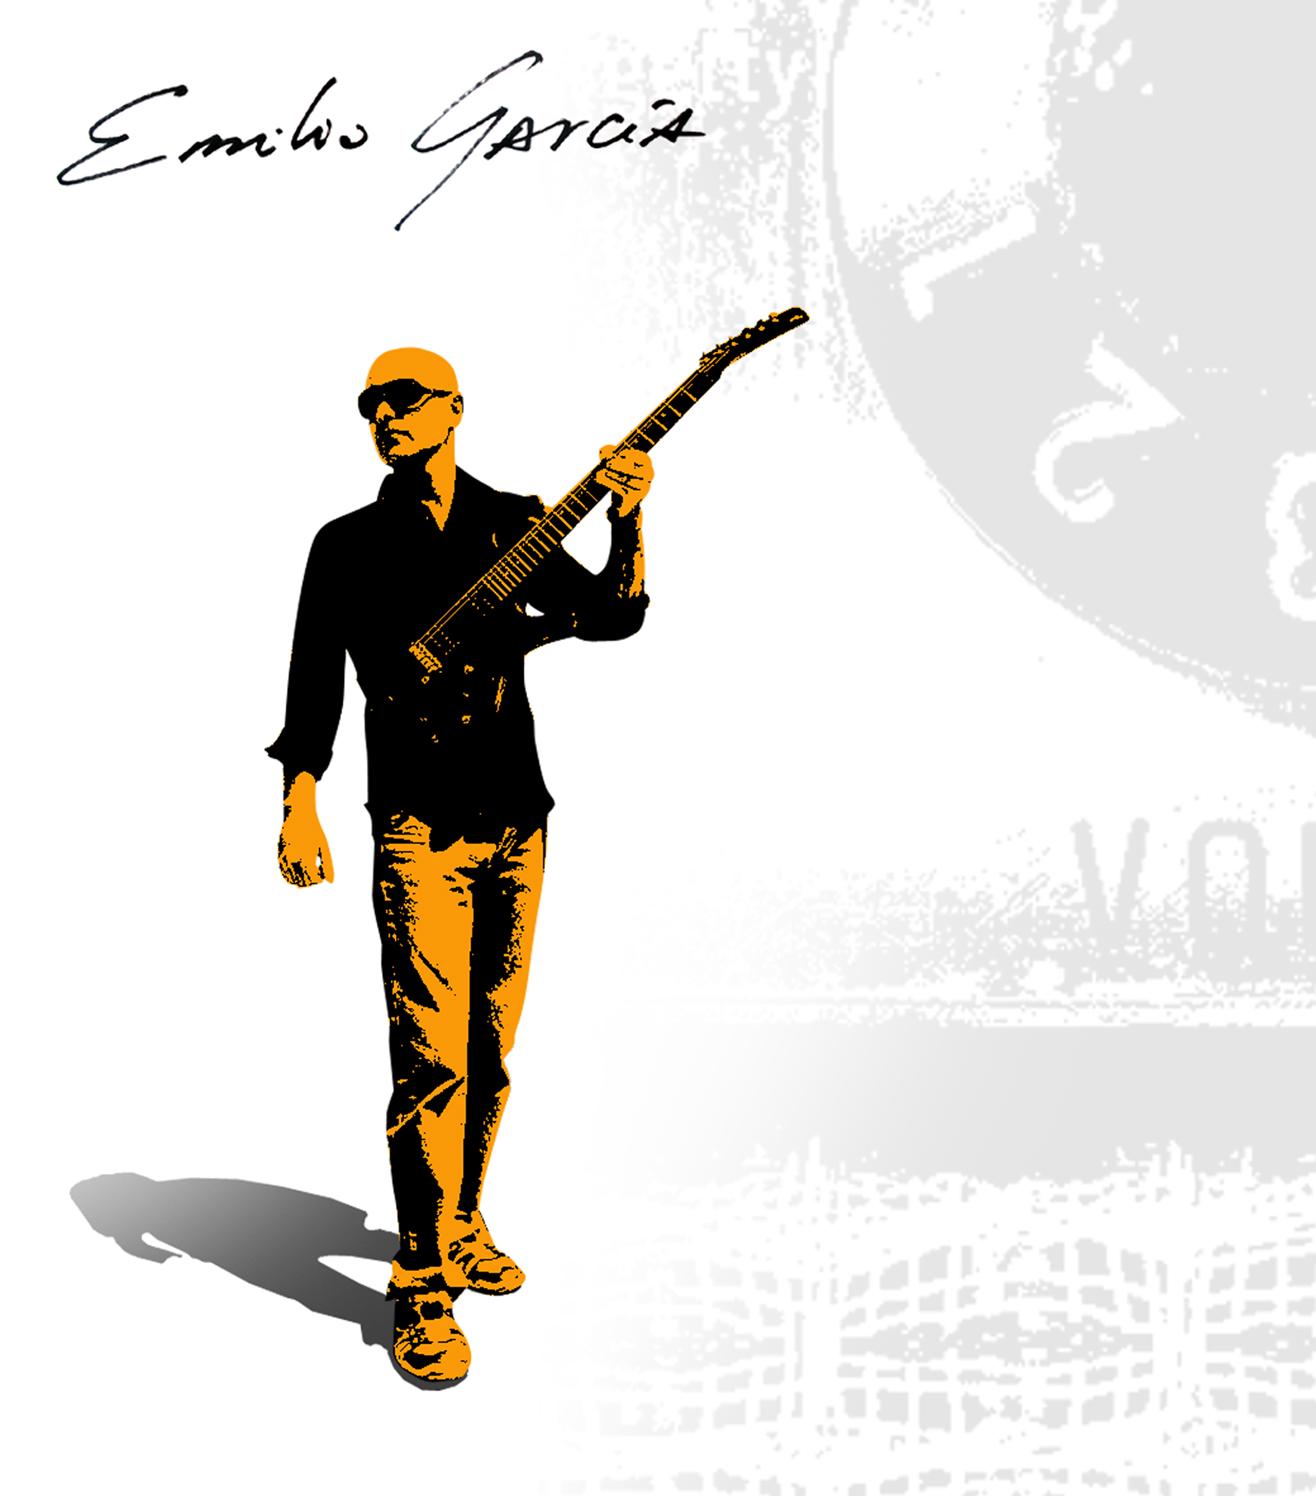 Emilio+garcia+5.jpg